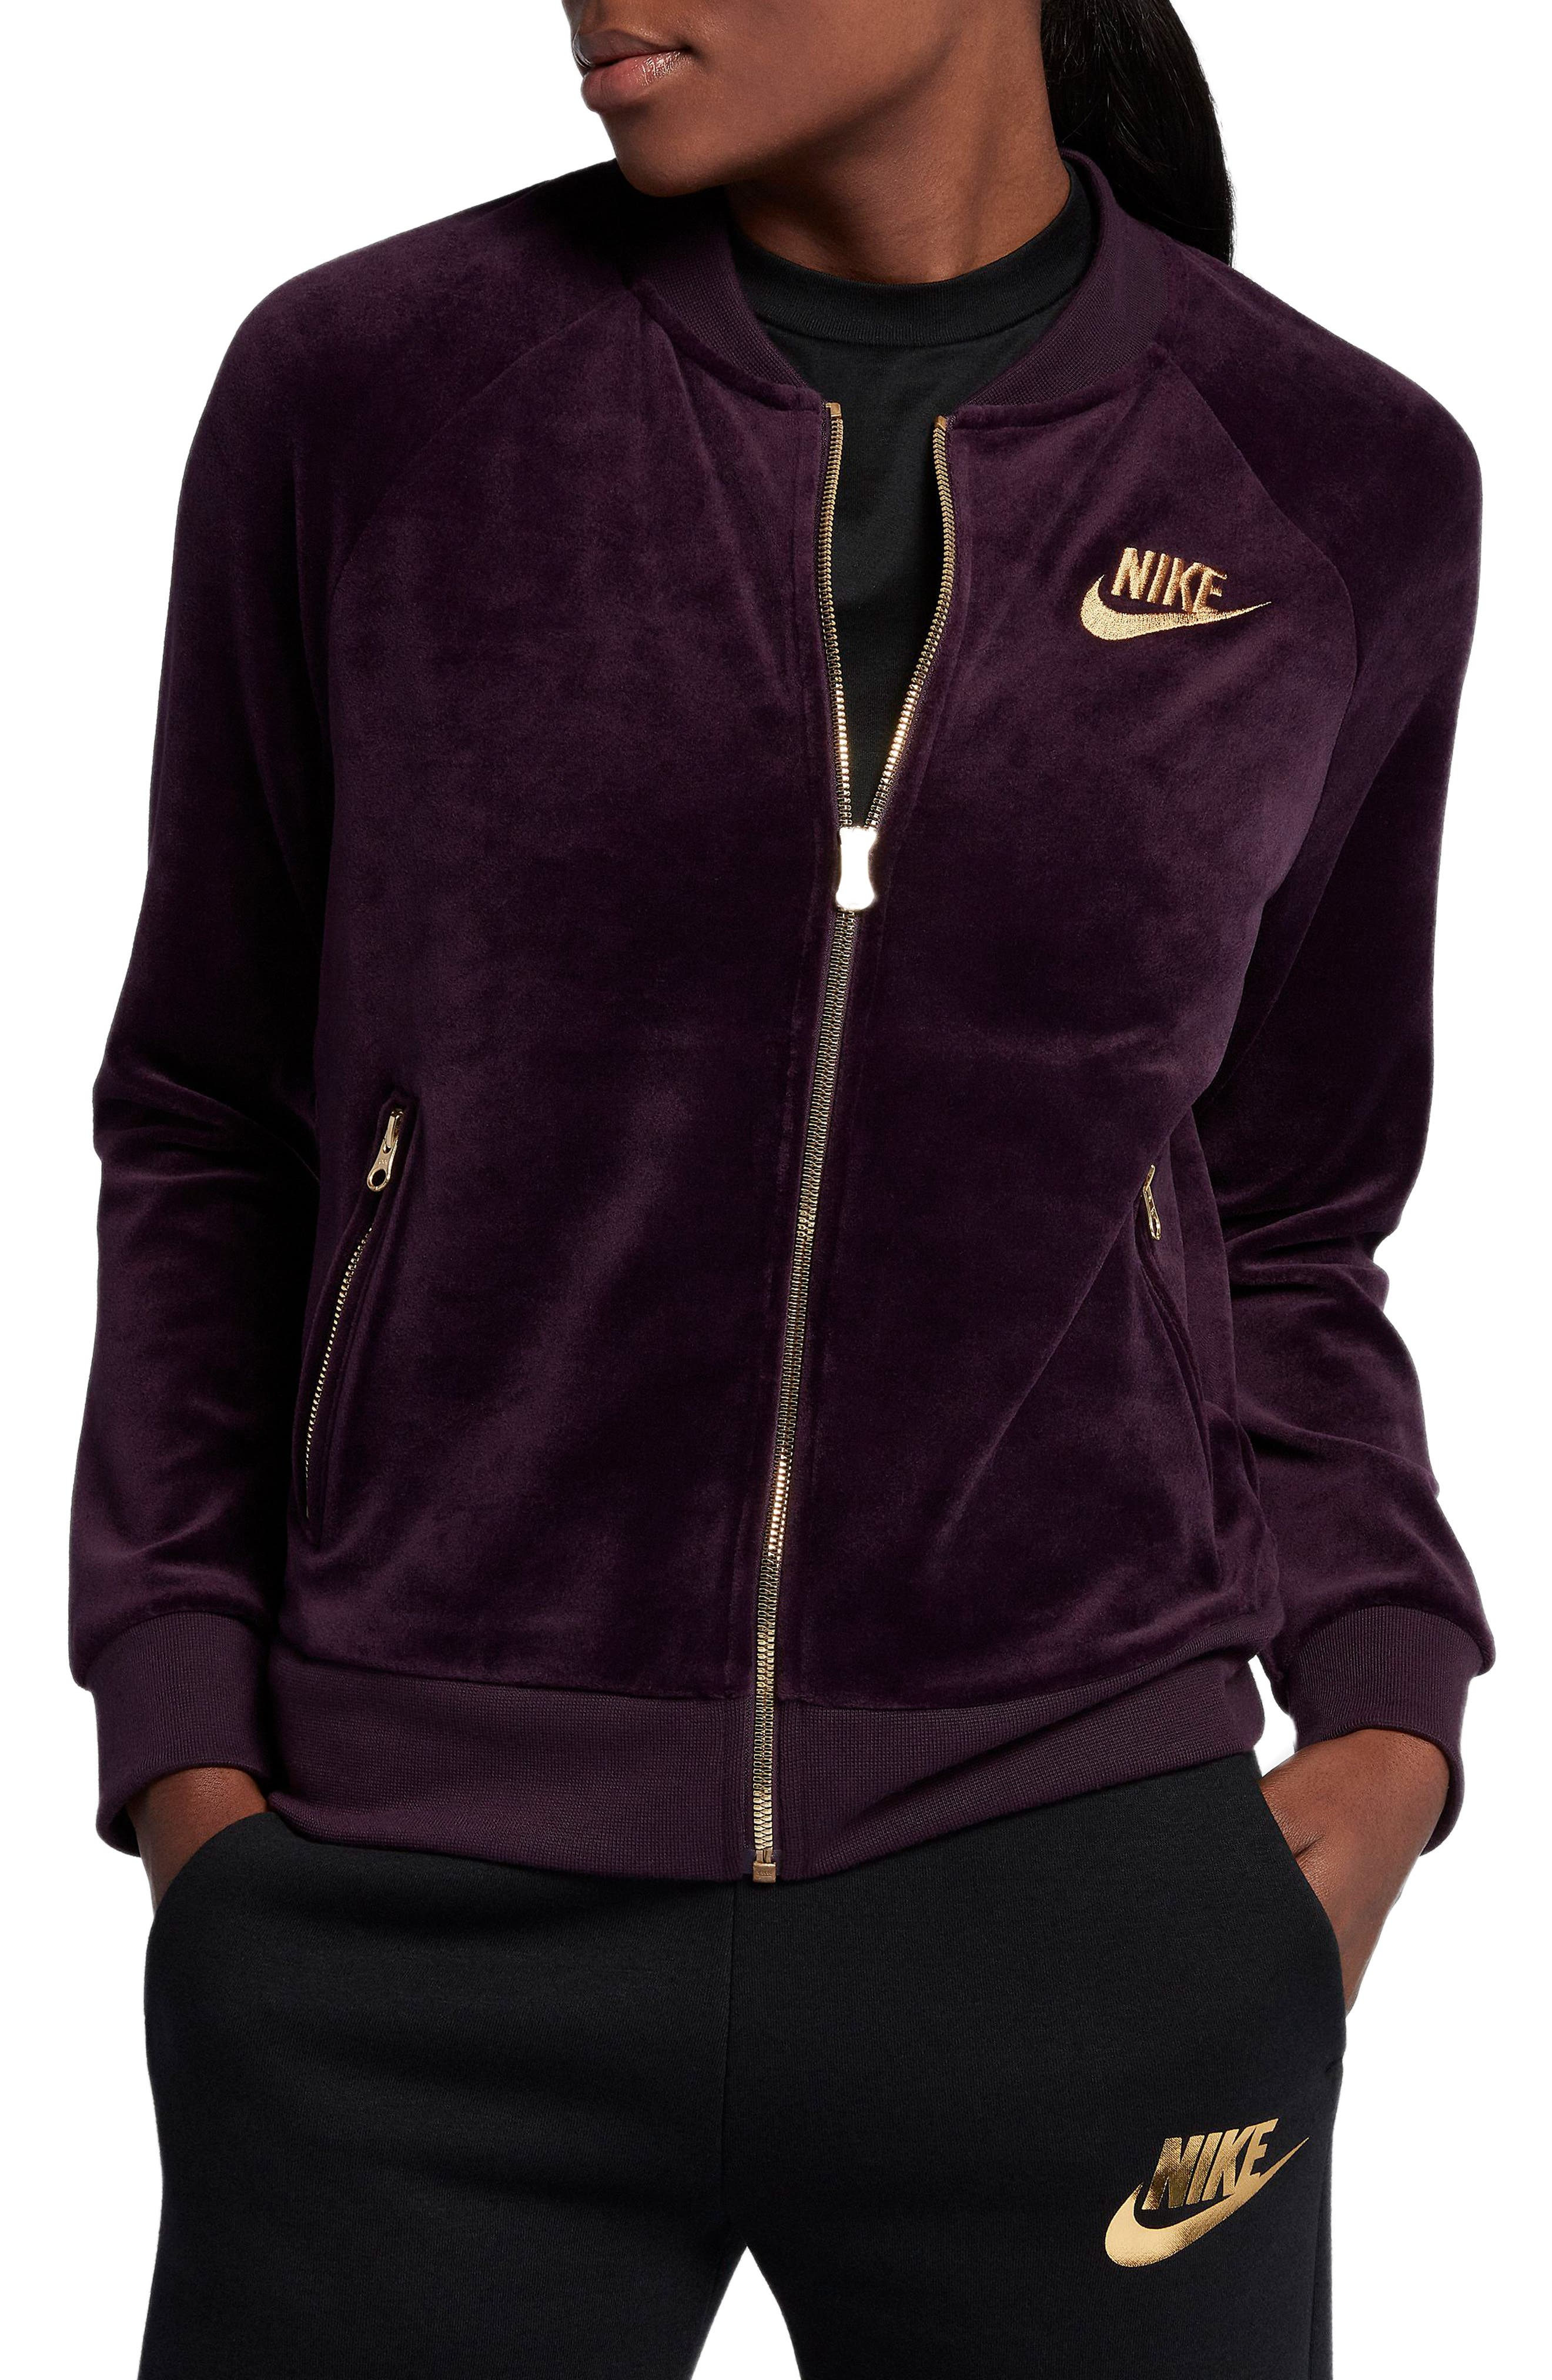 Velour Jacket,                         Main,                         color, Port Wine/ Metallic Gold